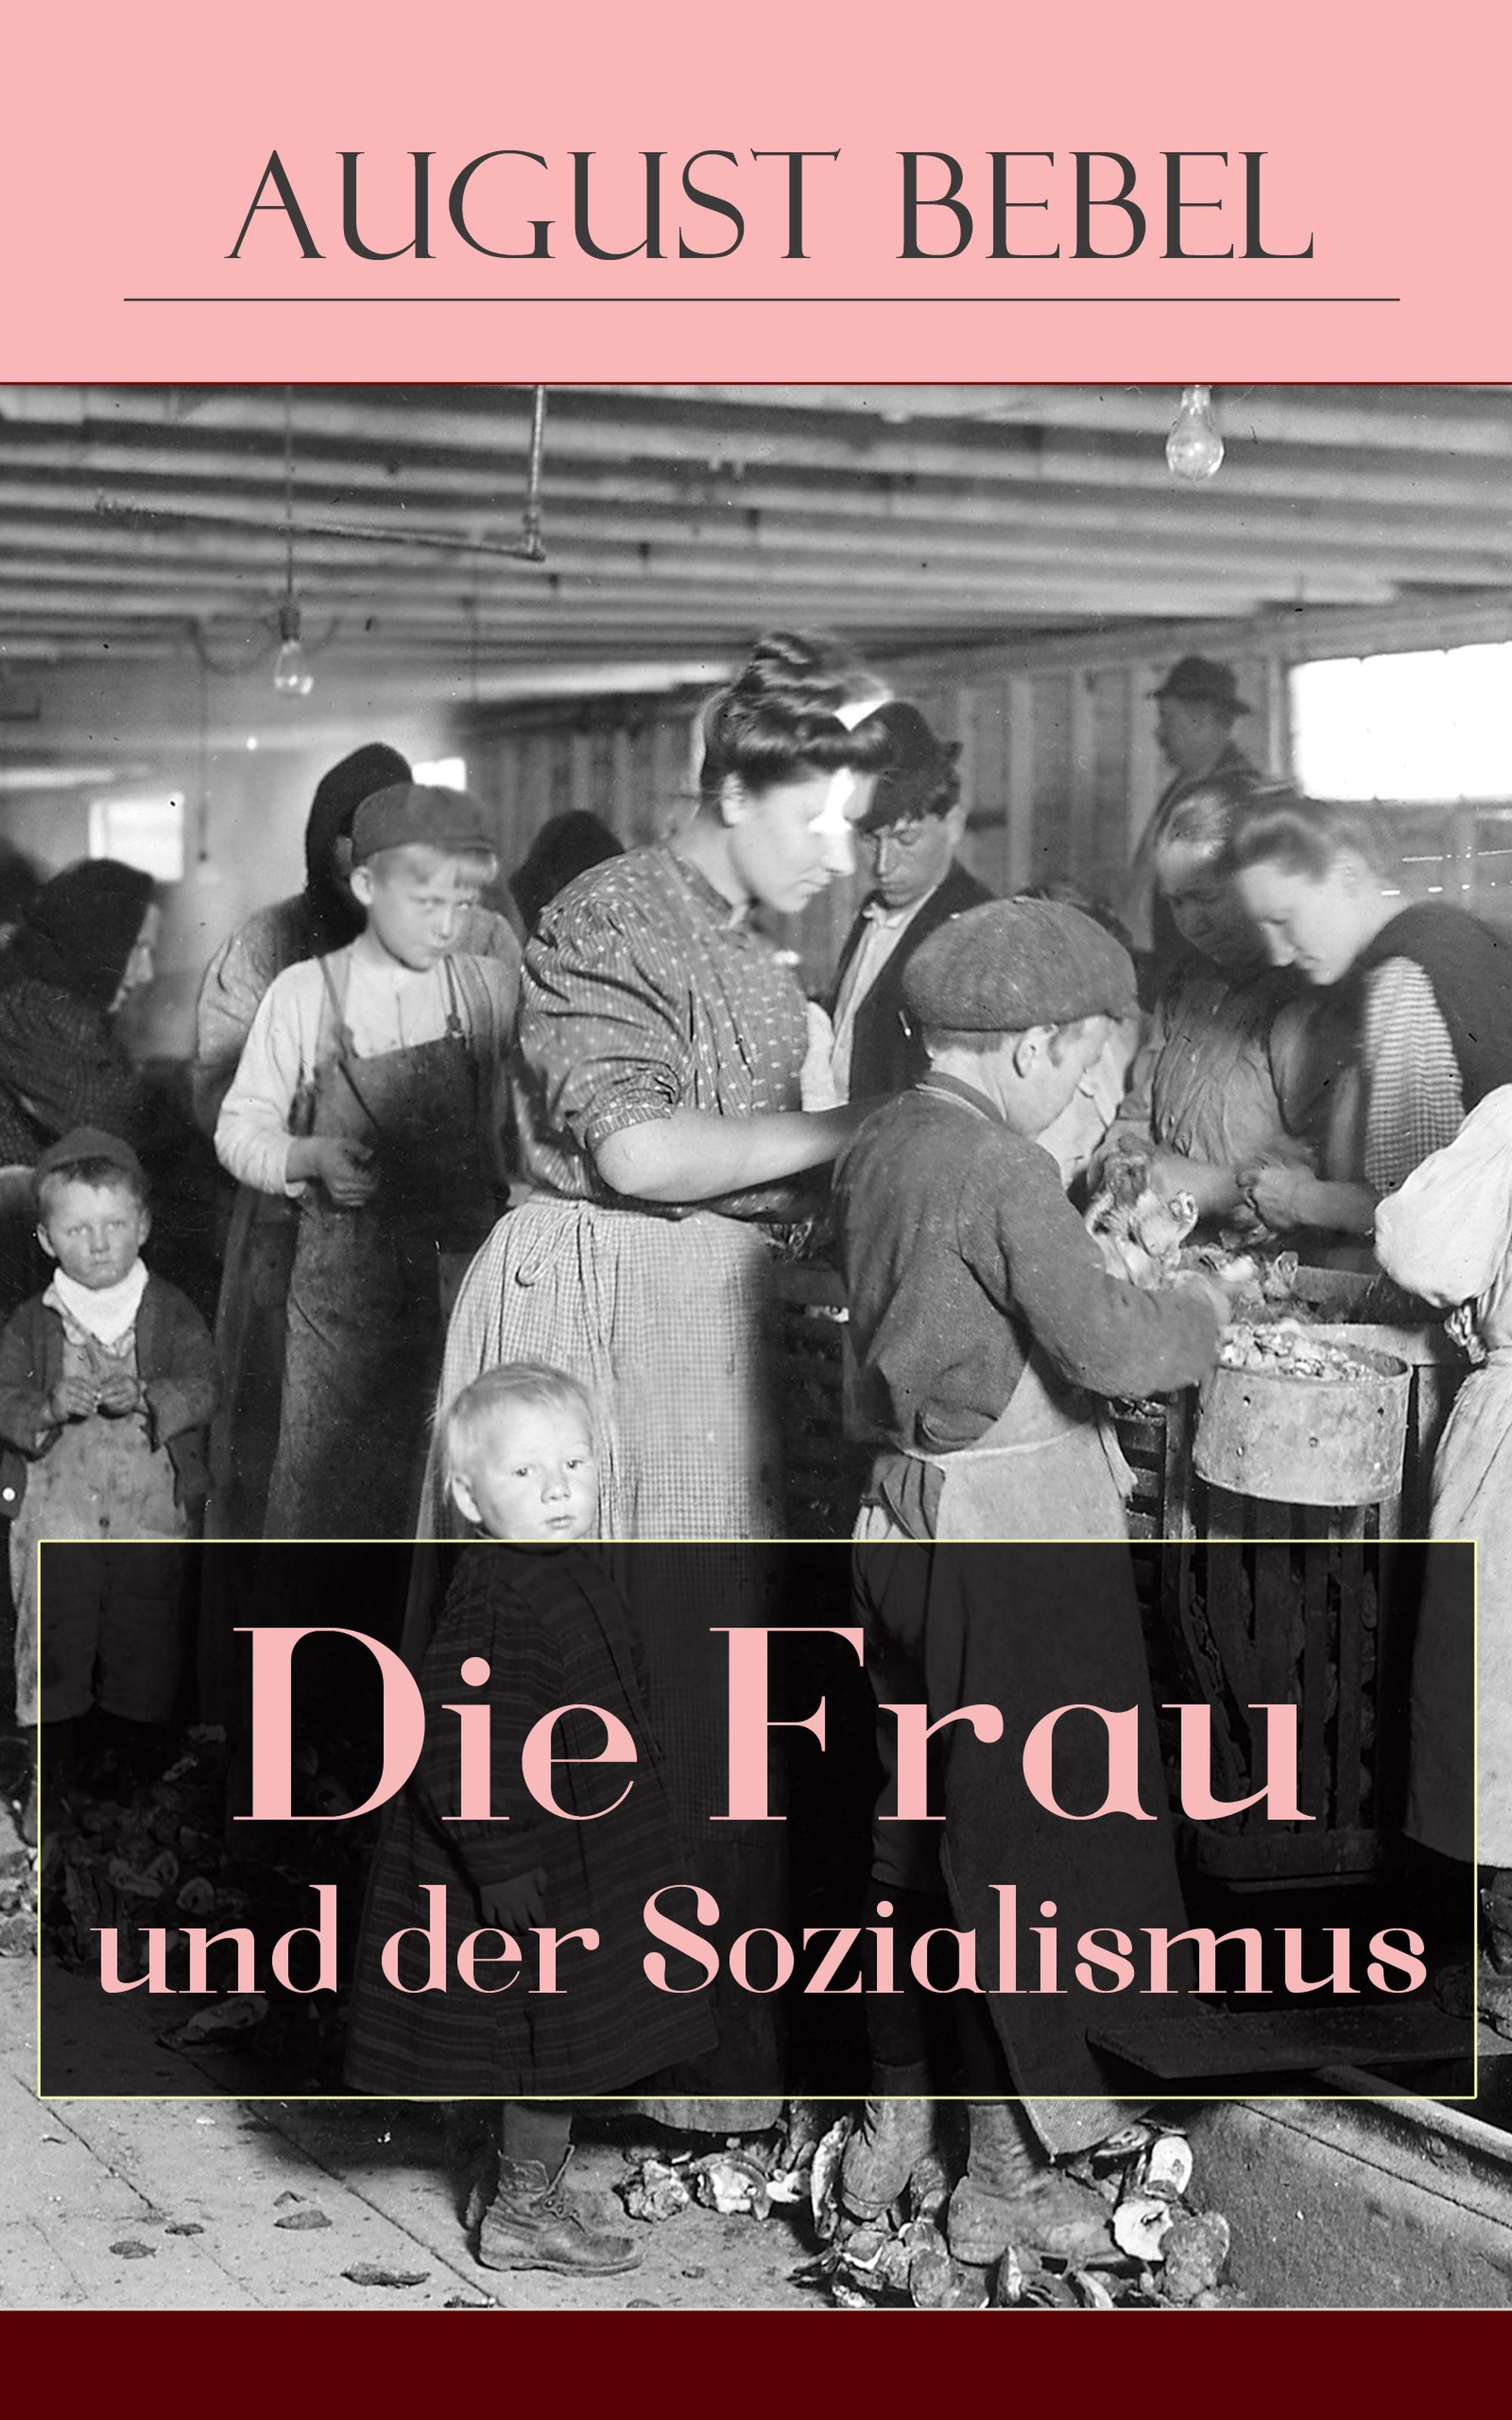 August Bebel Die Frau und der Sozialismus